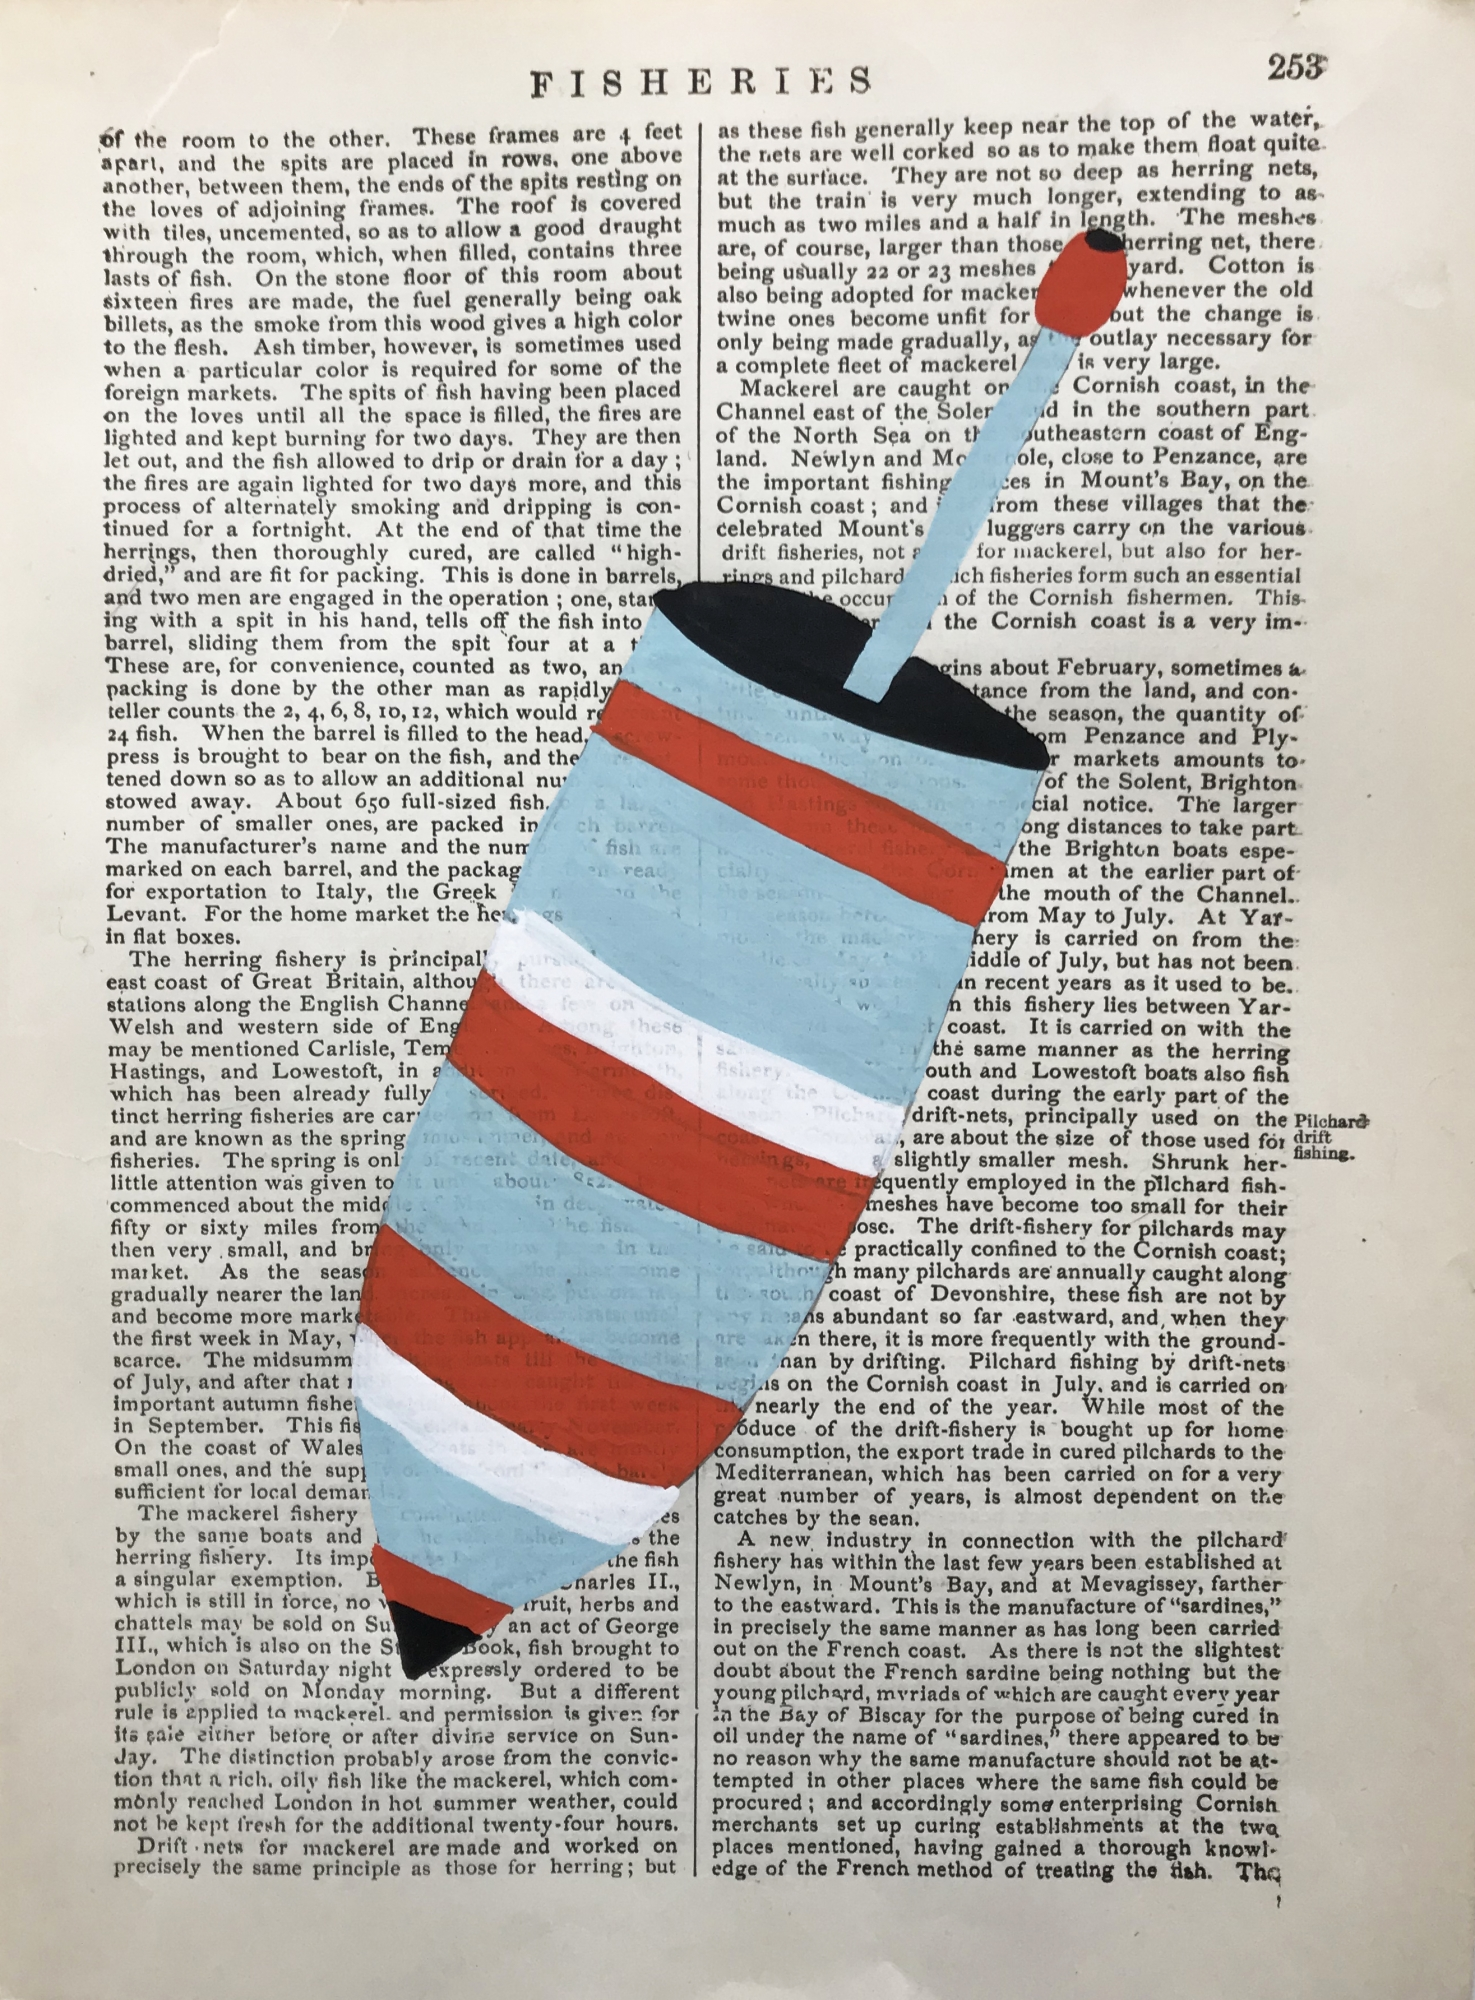 Fisheries 253 by Michela Sorrentino